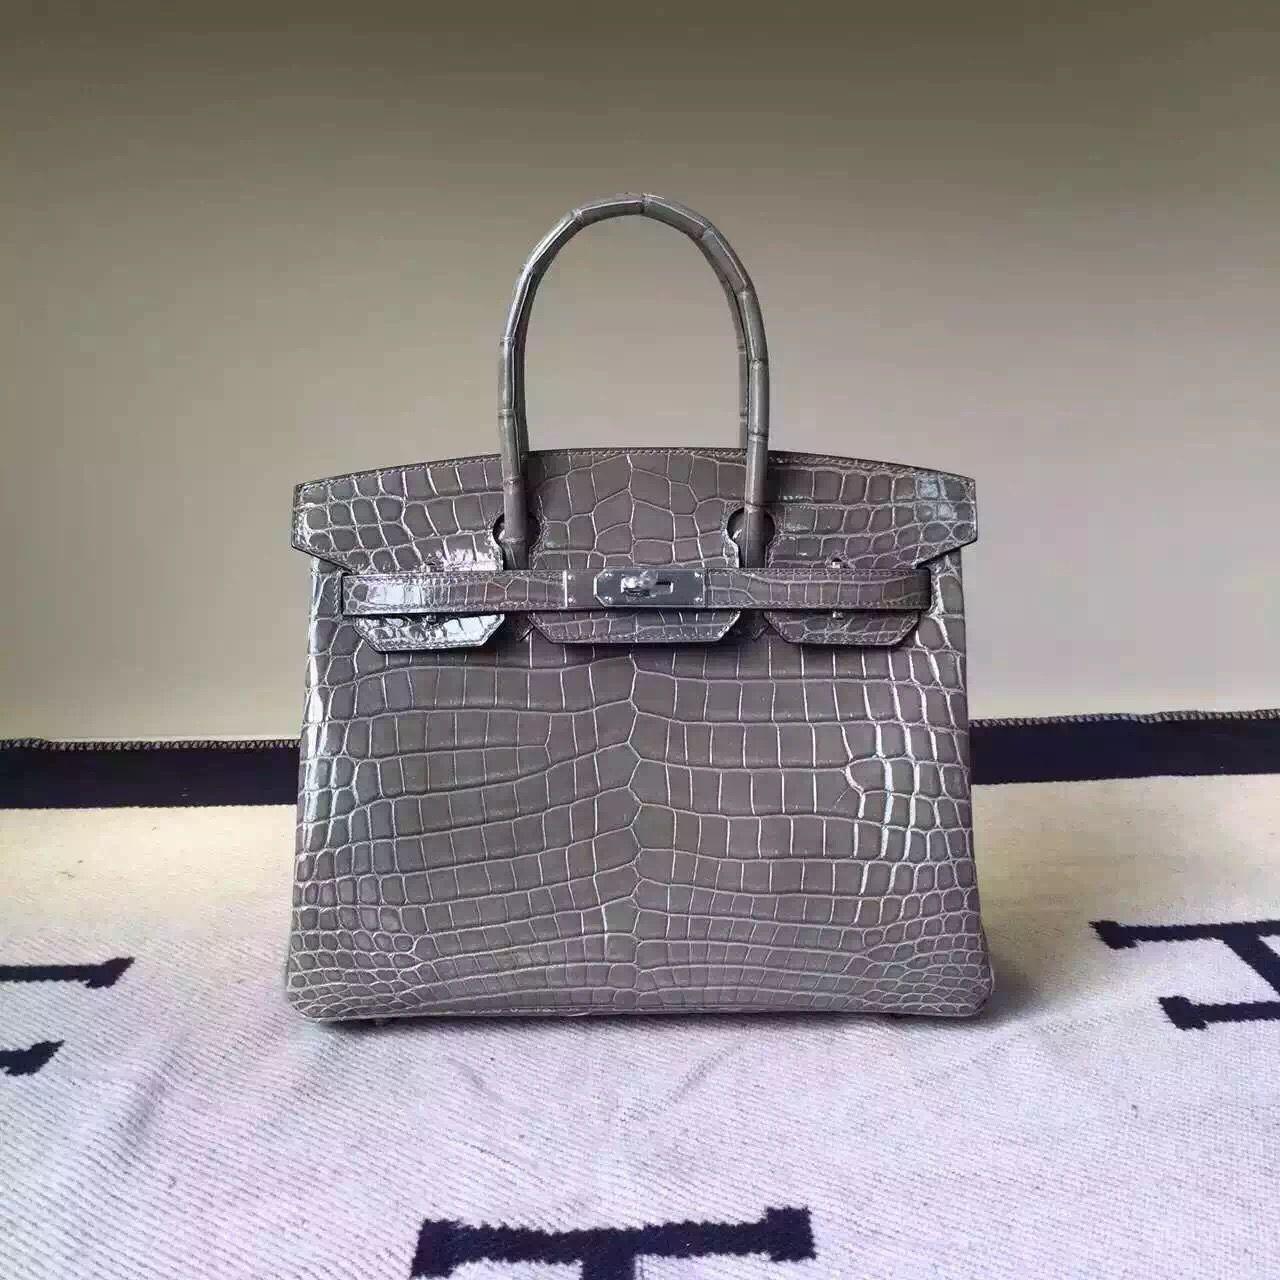 0caa5ff593b0 Hermes Birkin 30 35 Imported Crocodile Leather Bag Dark Gray(SHW ...